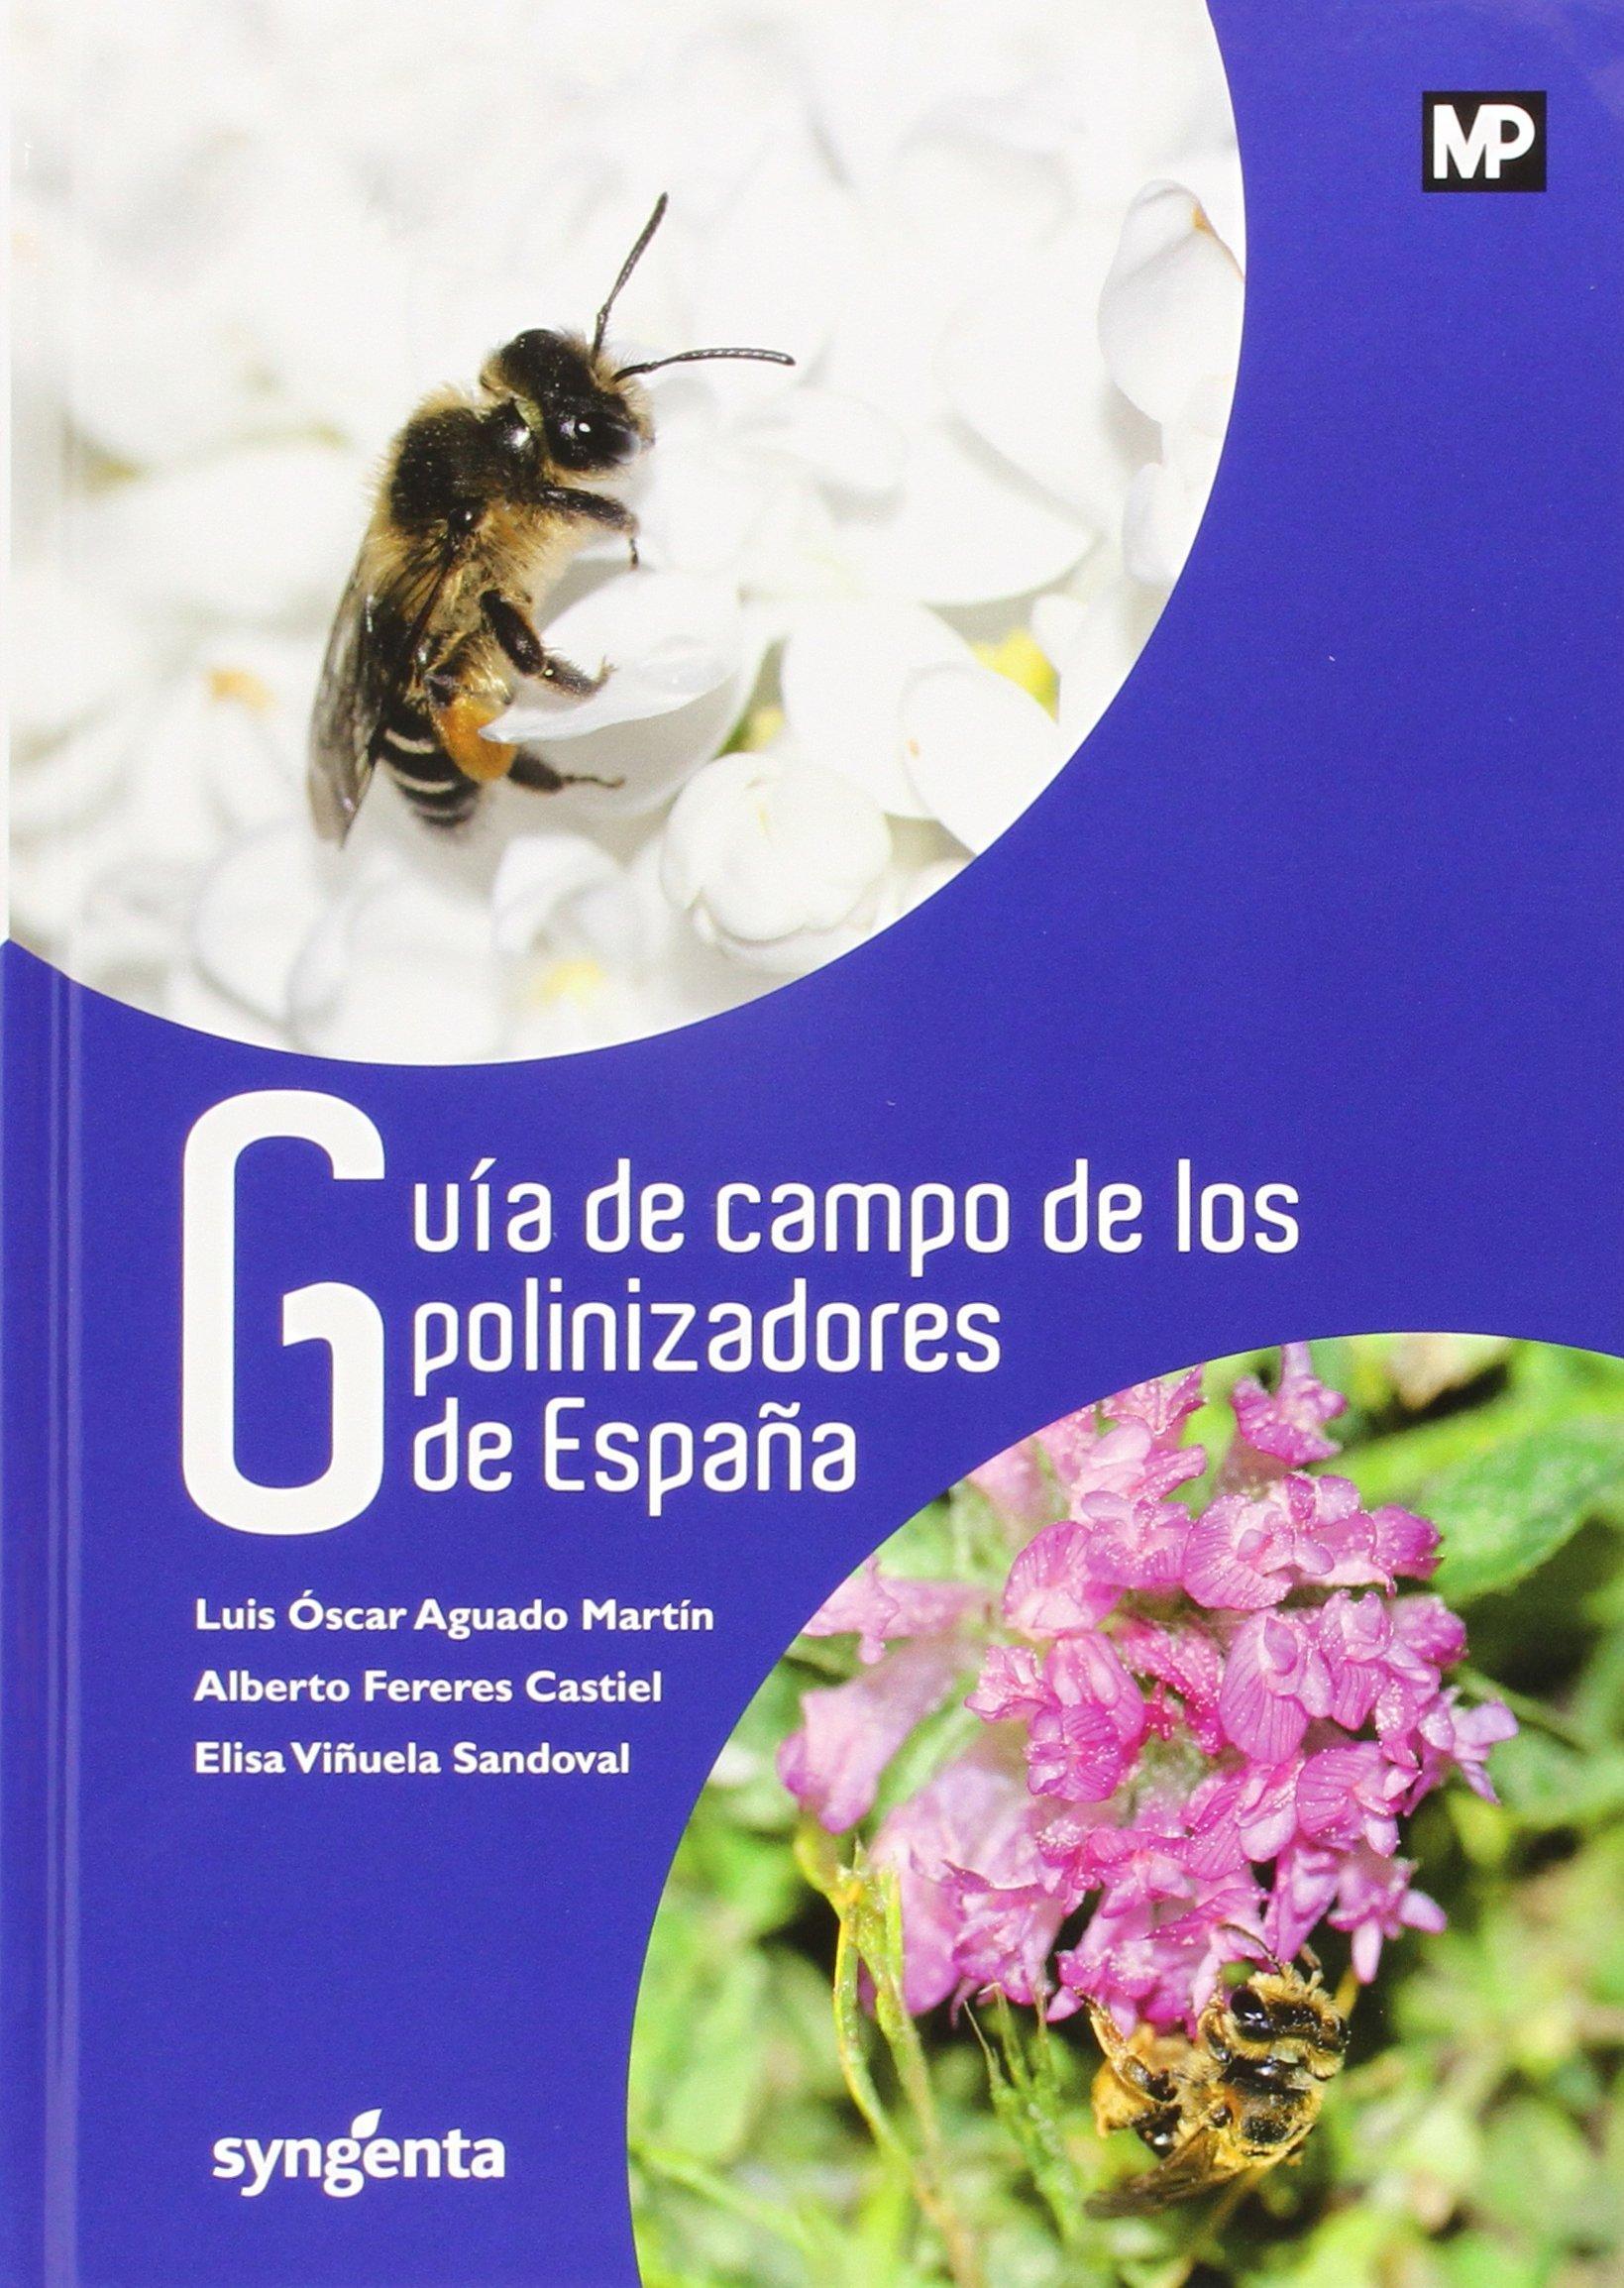 Guía De Campo De Los Polinizadores De España Agricultura mundi Prensa de Luis Óscar Aguado Martín 1 jun 2015 Tapa blanda: Amazon.es: Libros